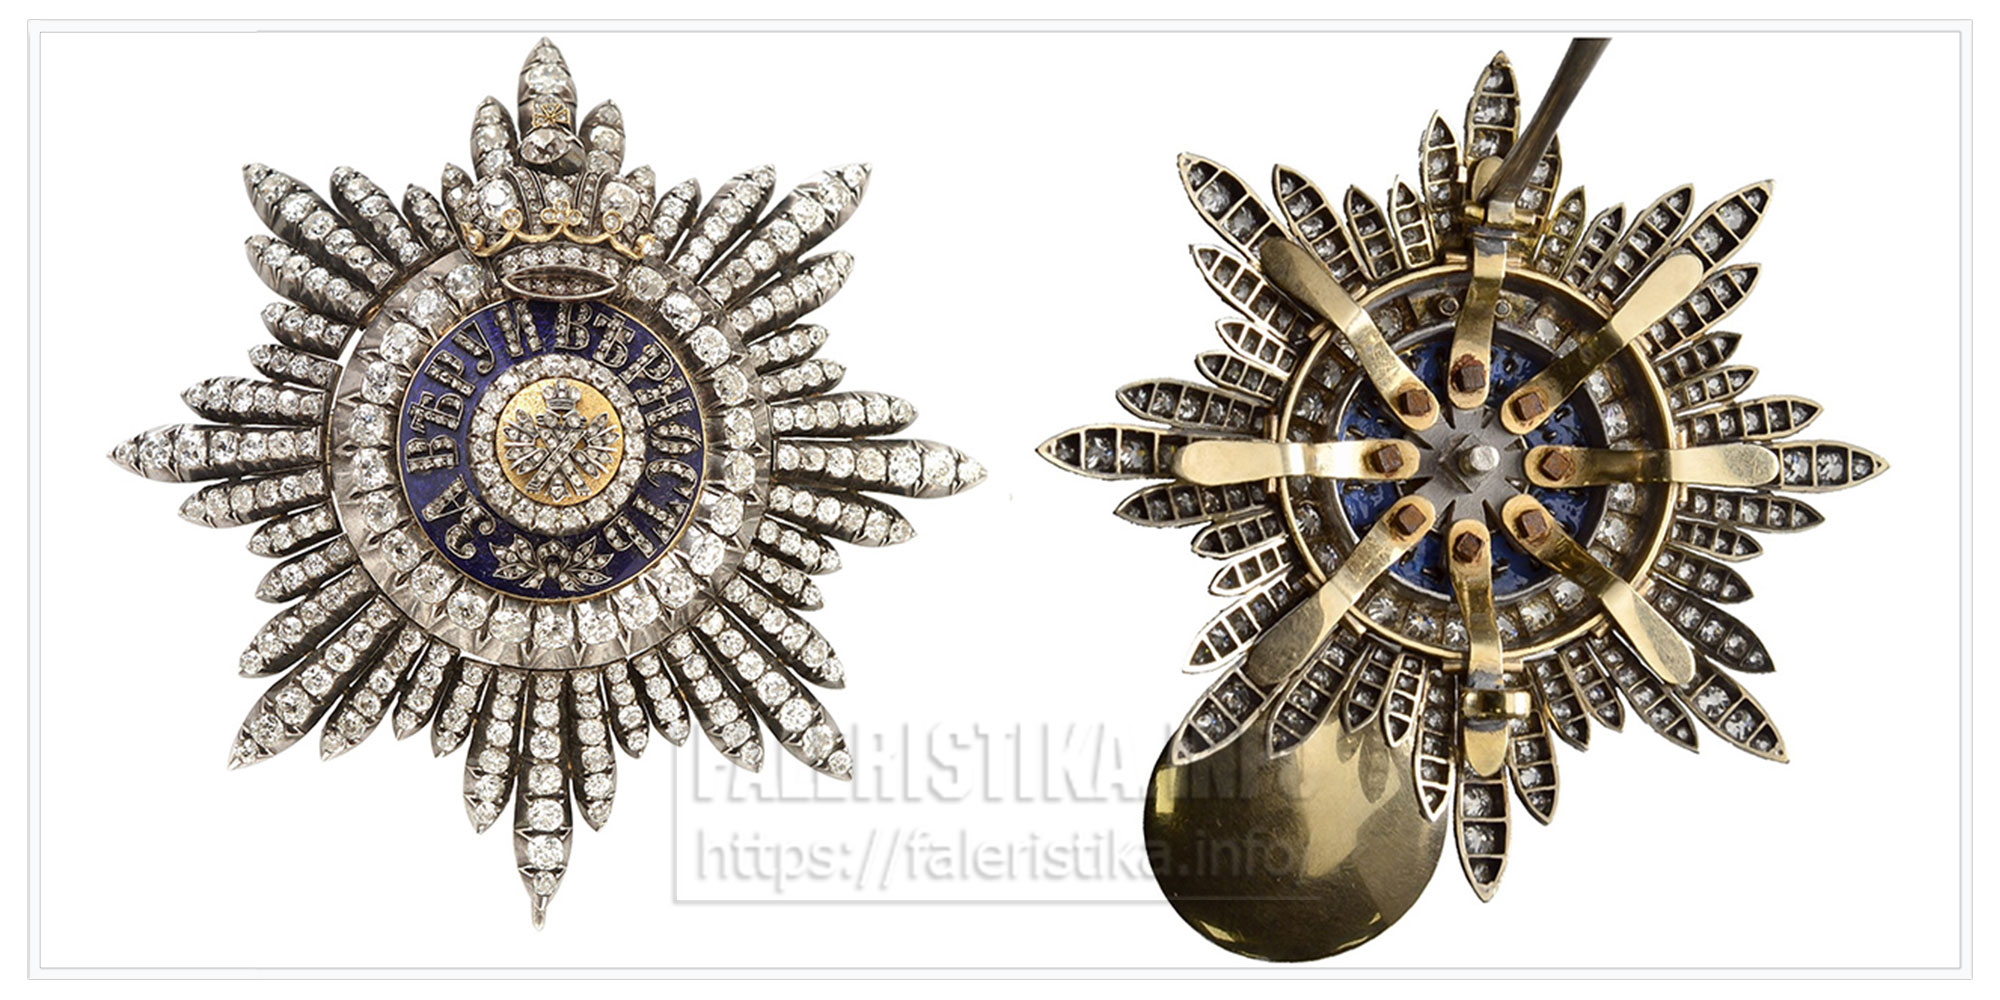 Звезда ордена Св. Андрея Первозванного с бриллиантами